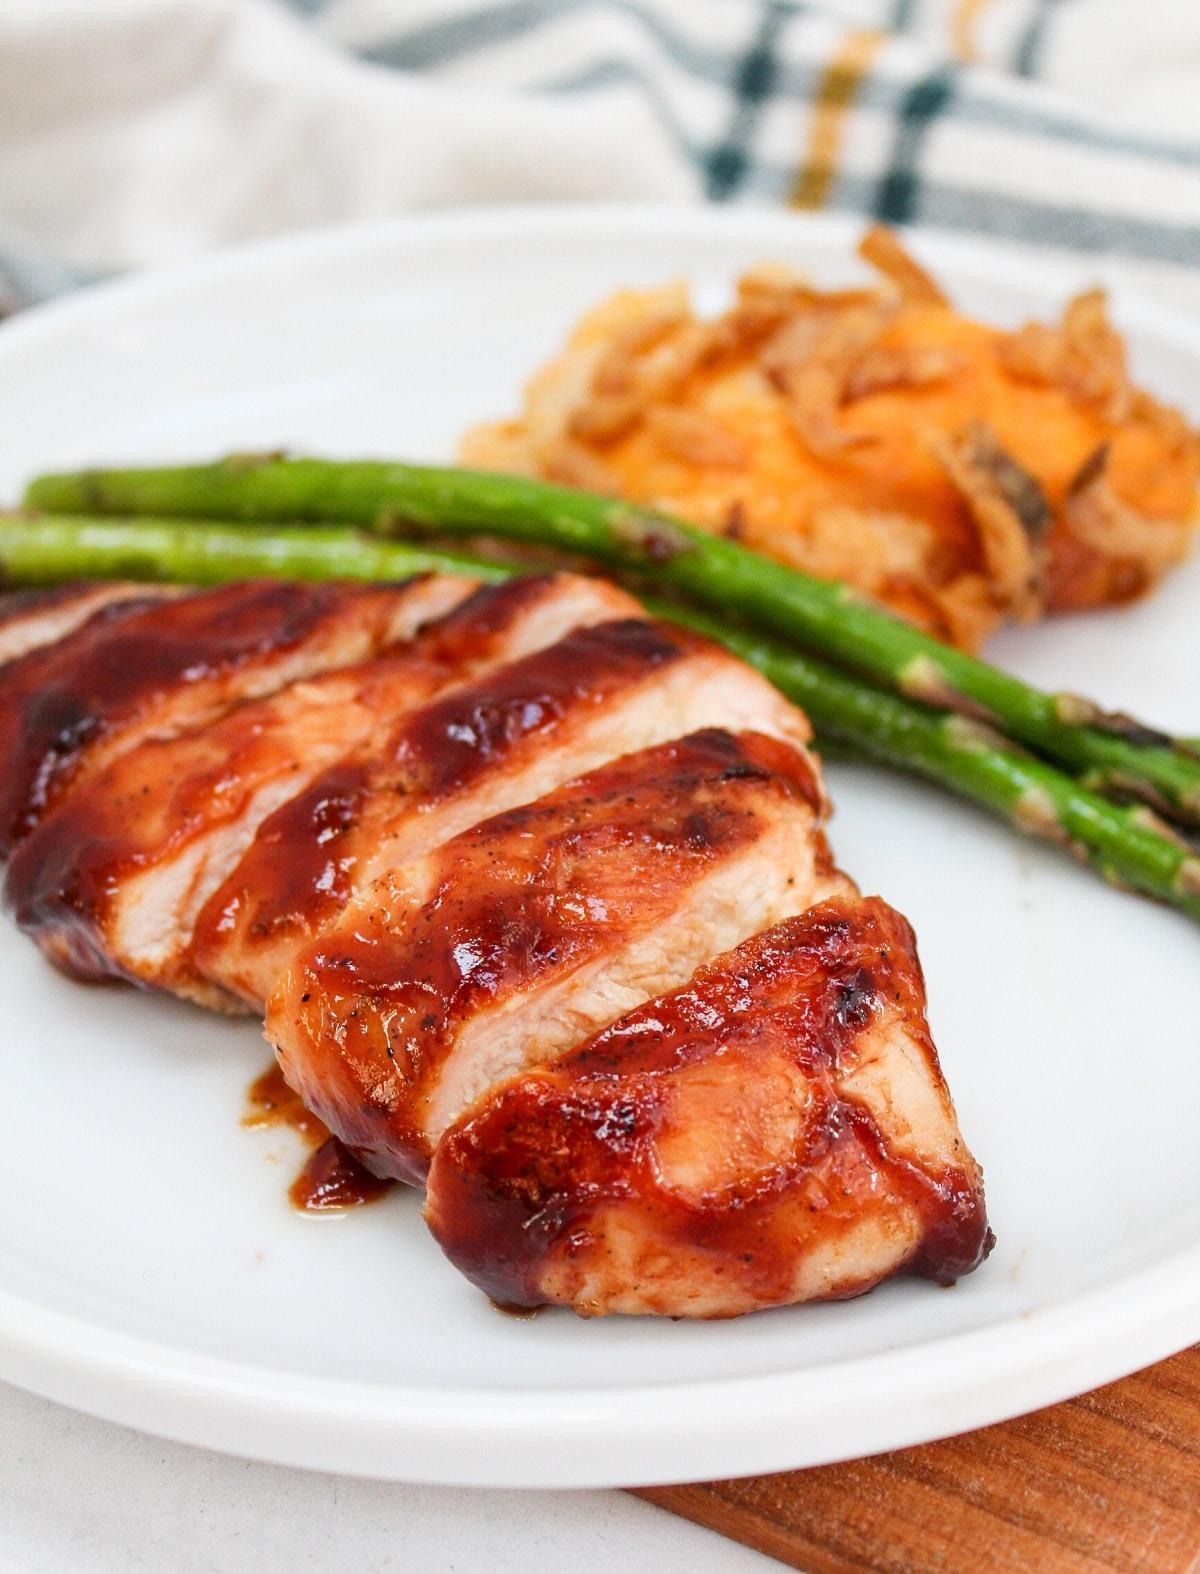 plated sliced bbq chicken